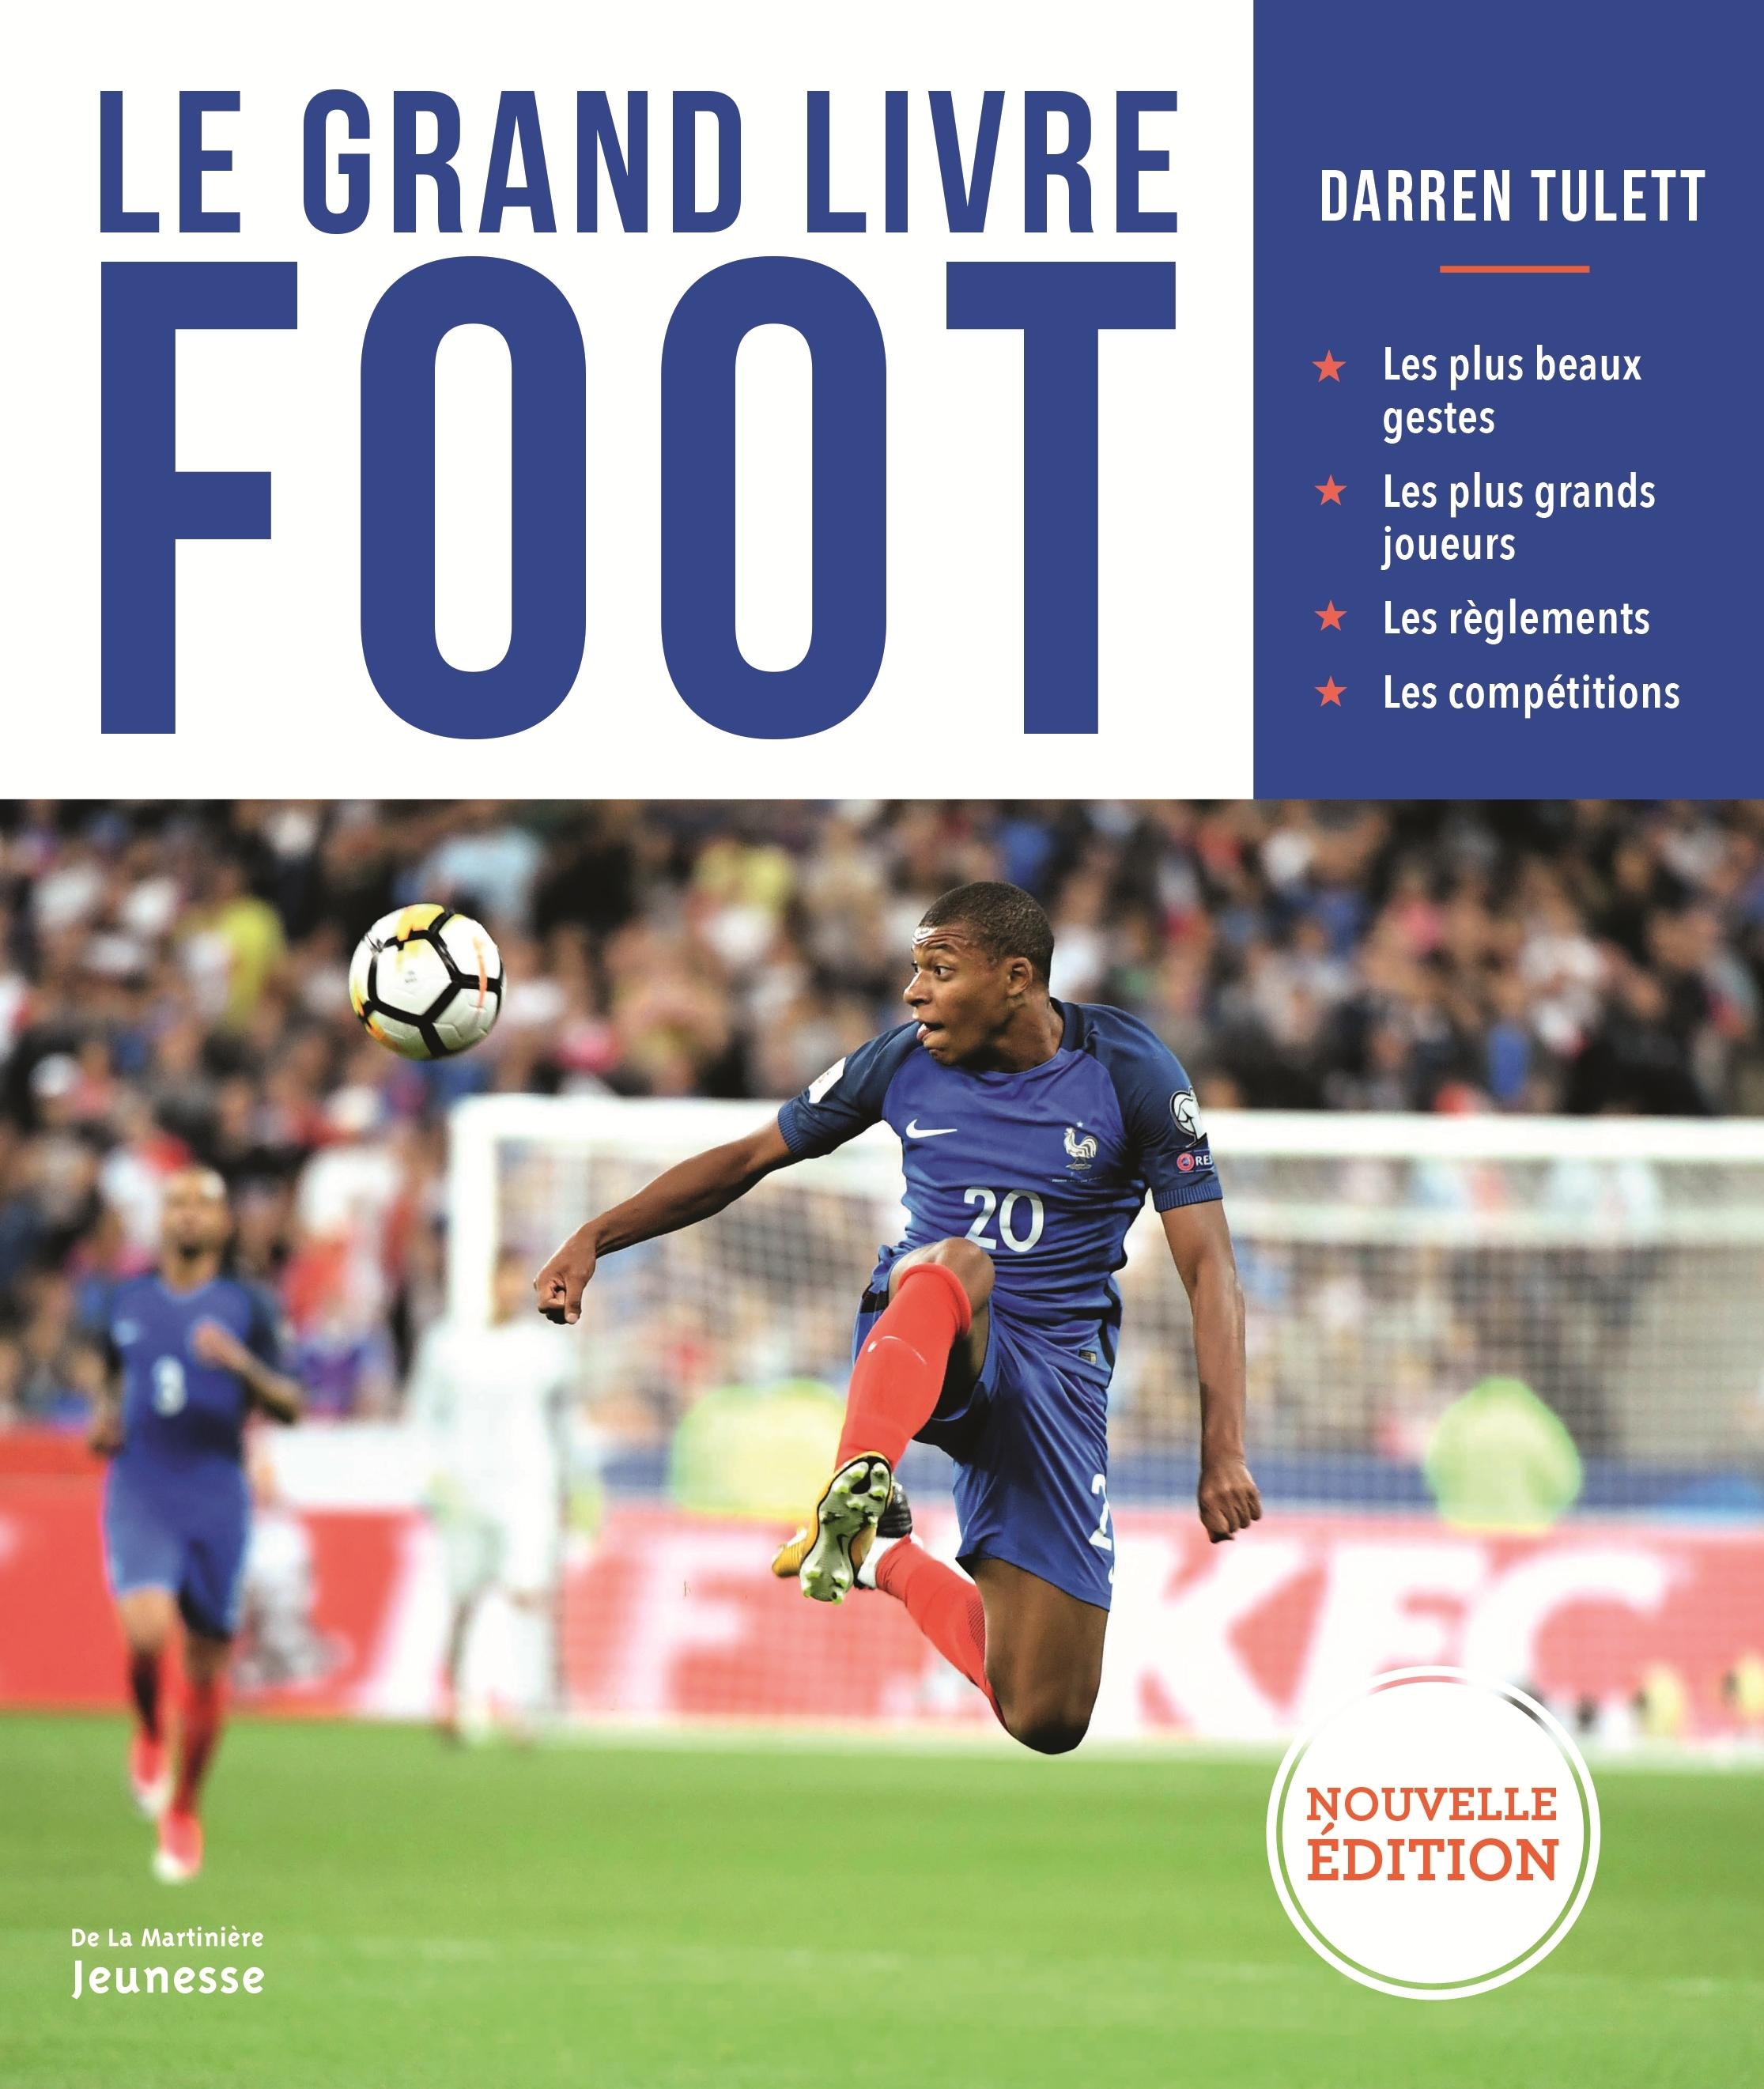 LE GRAND LIVRE FOOT